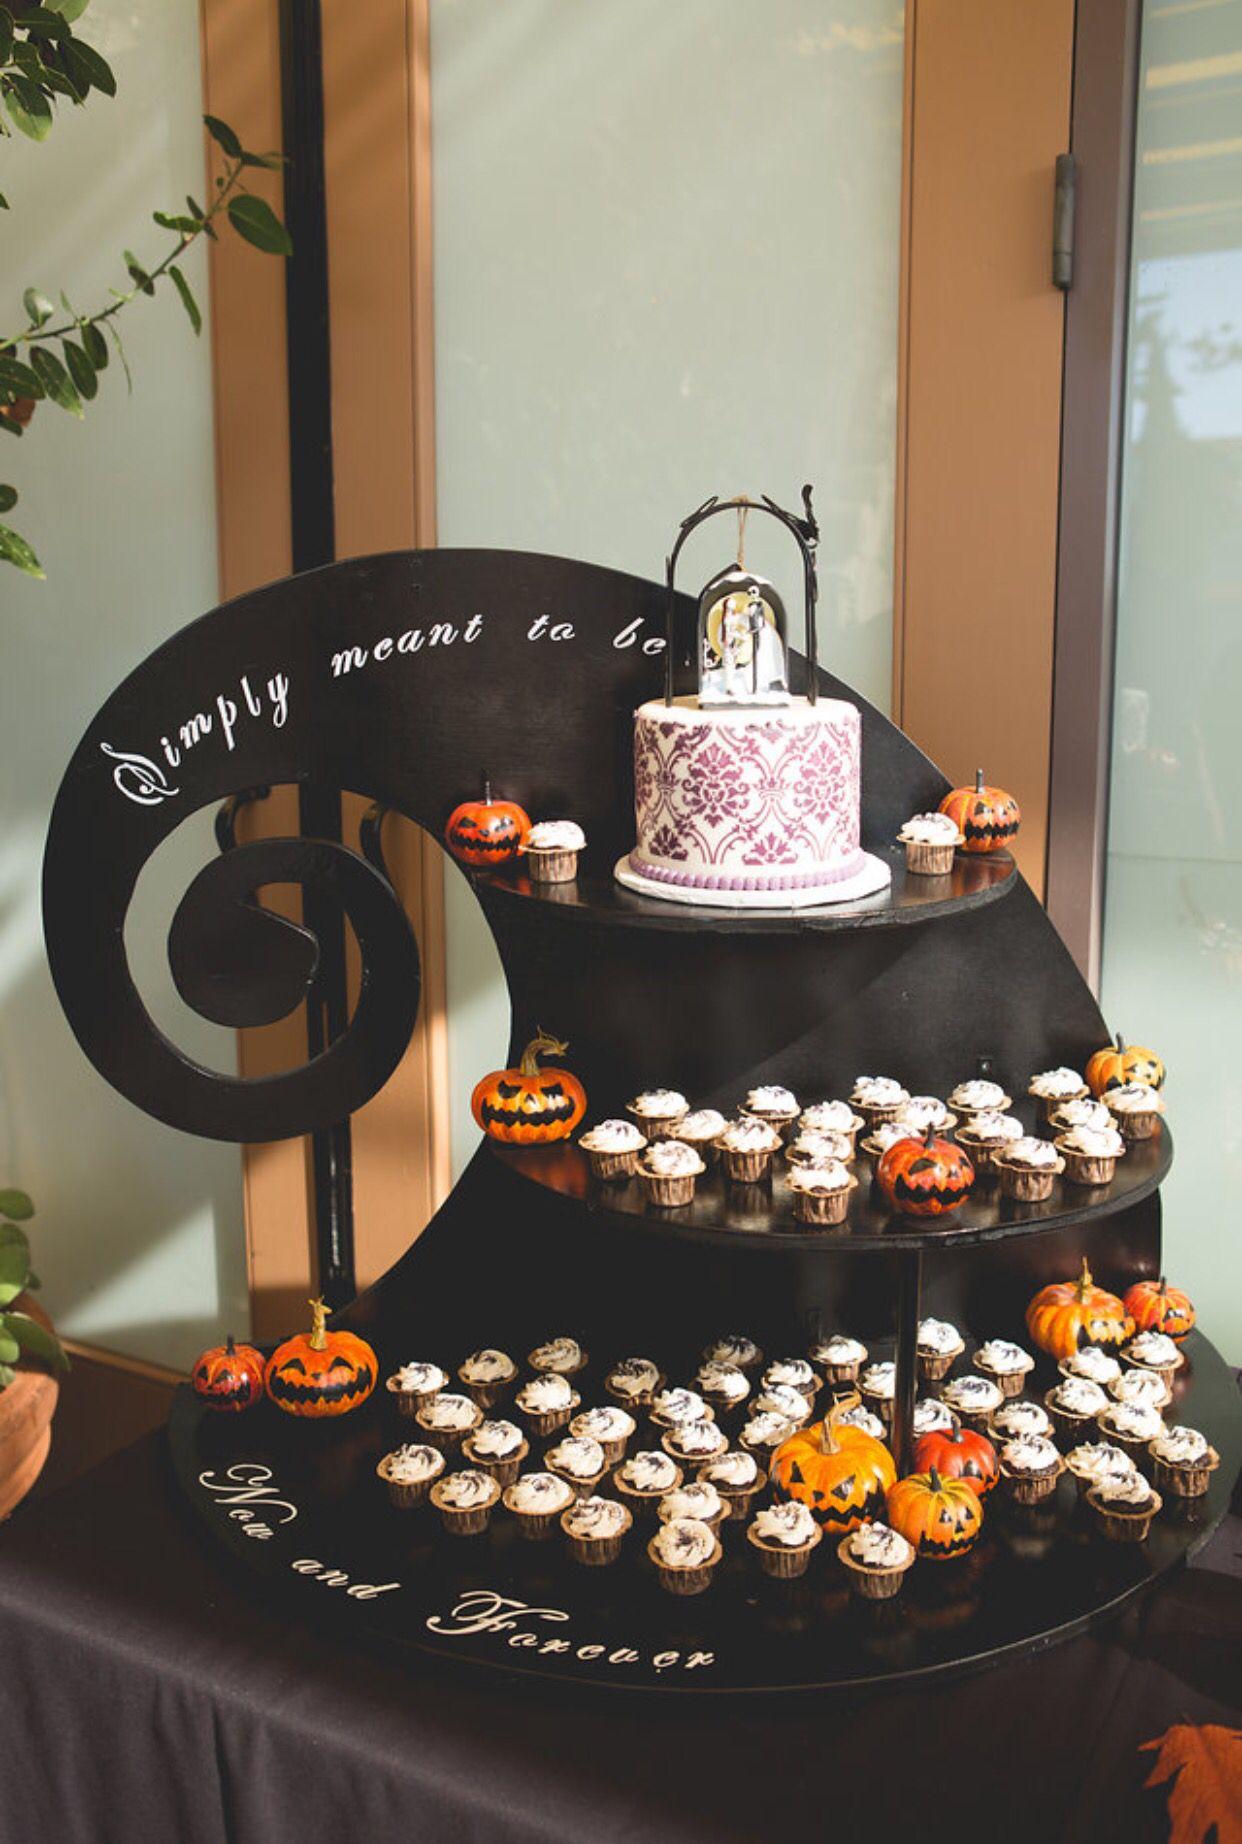 Pin by Eileen Minnick on Halloween wedding in 2018 | Pinterest ...